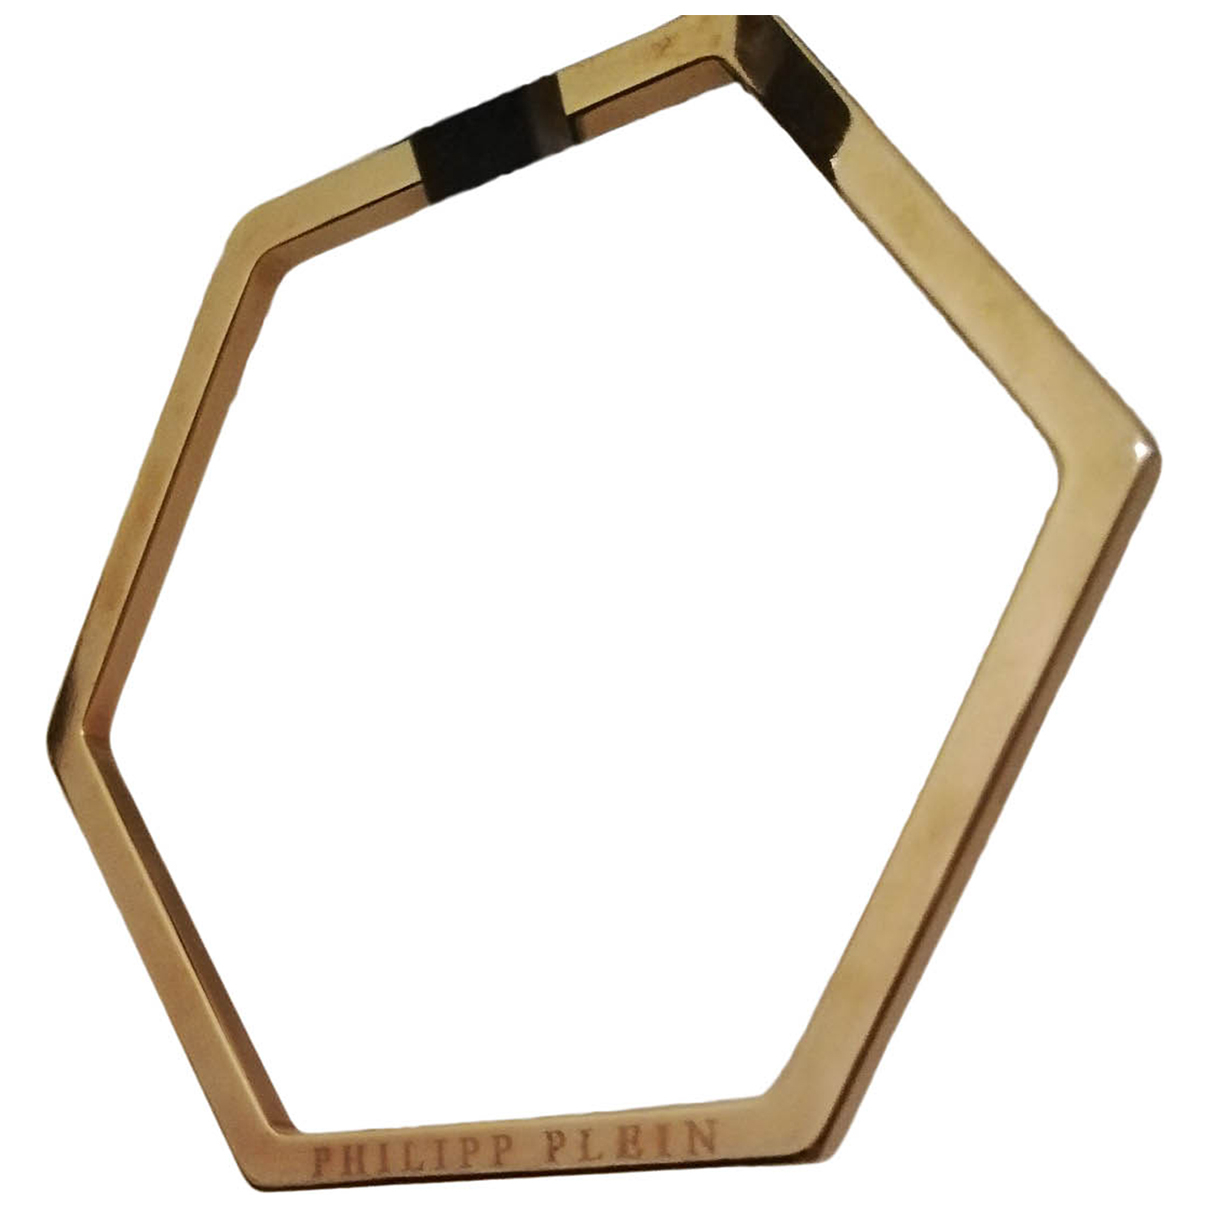 Philipp Plein \N Armband in  Gold Metall